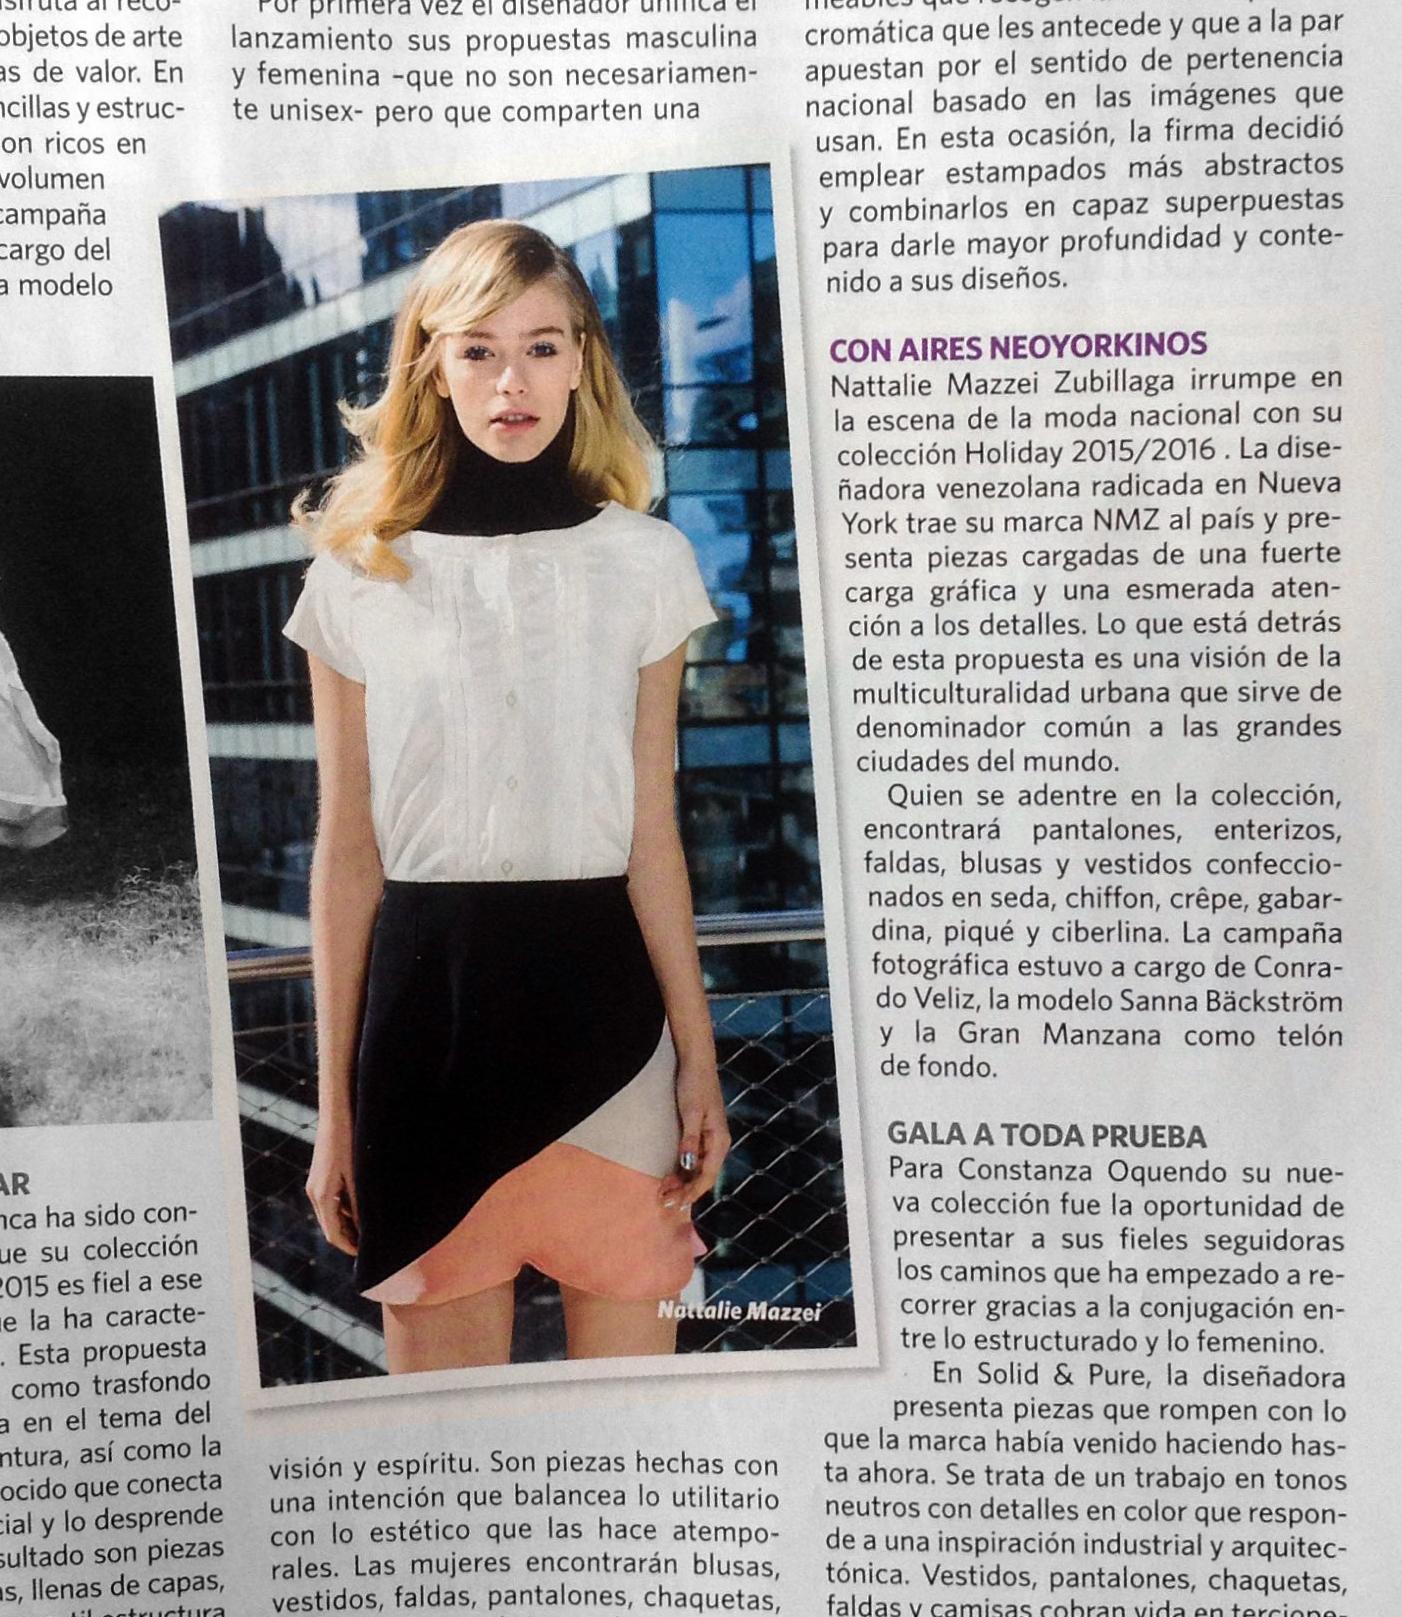 Revista VARIEDADES - Diciembre 2015